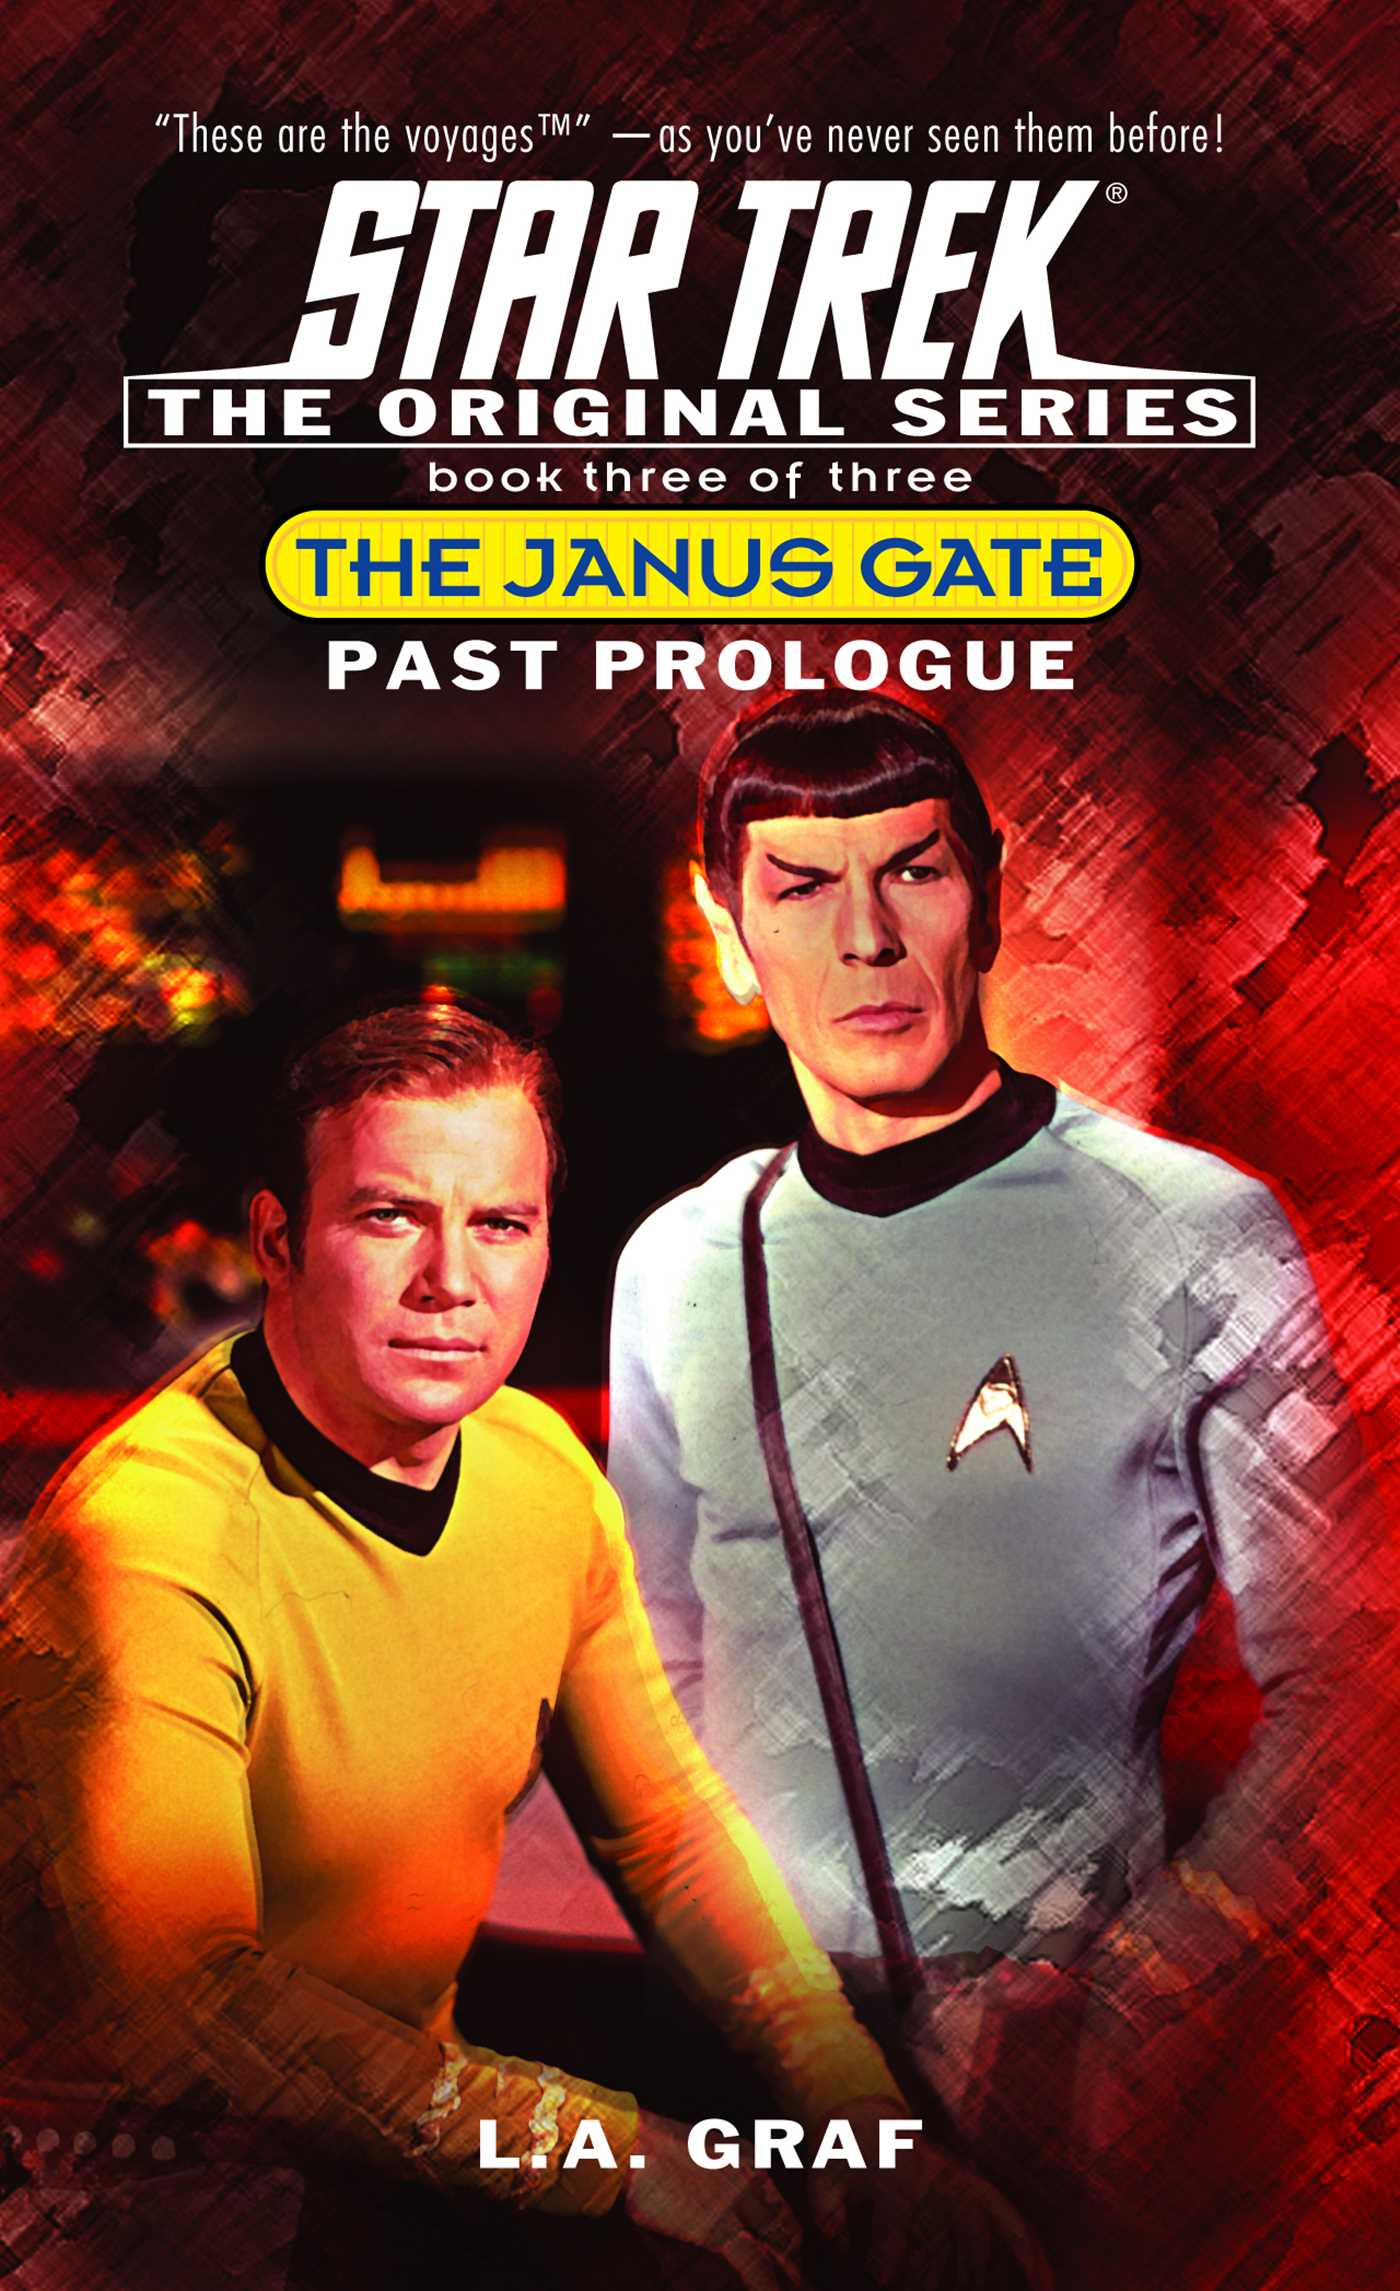 The past prologue 9780743445979 hr